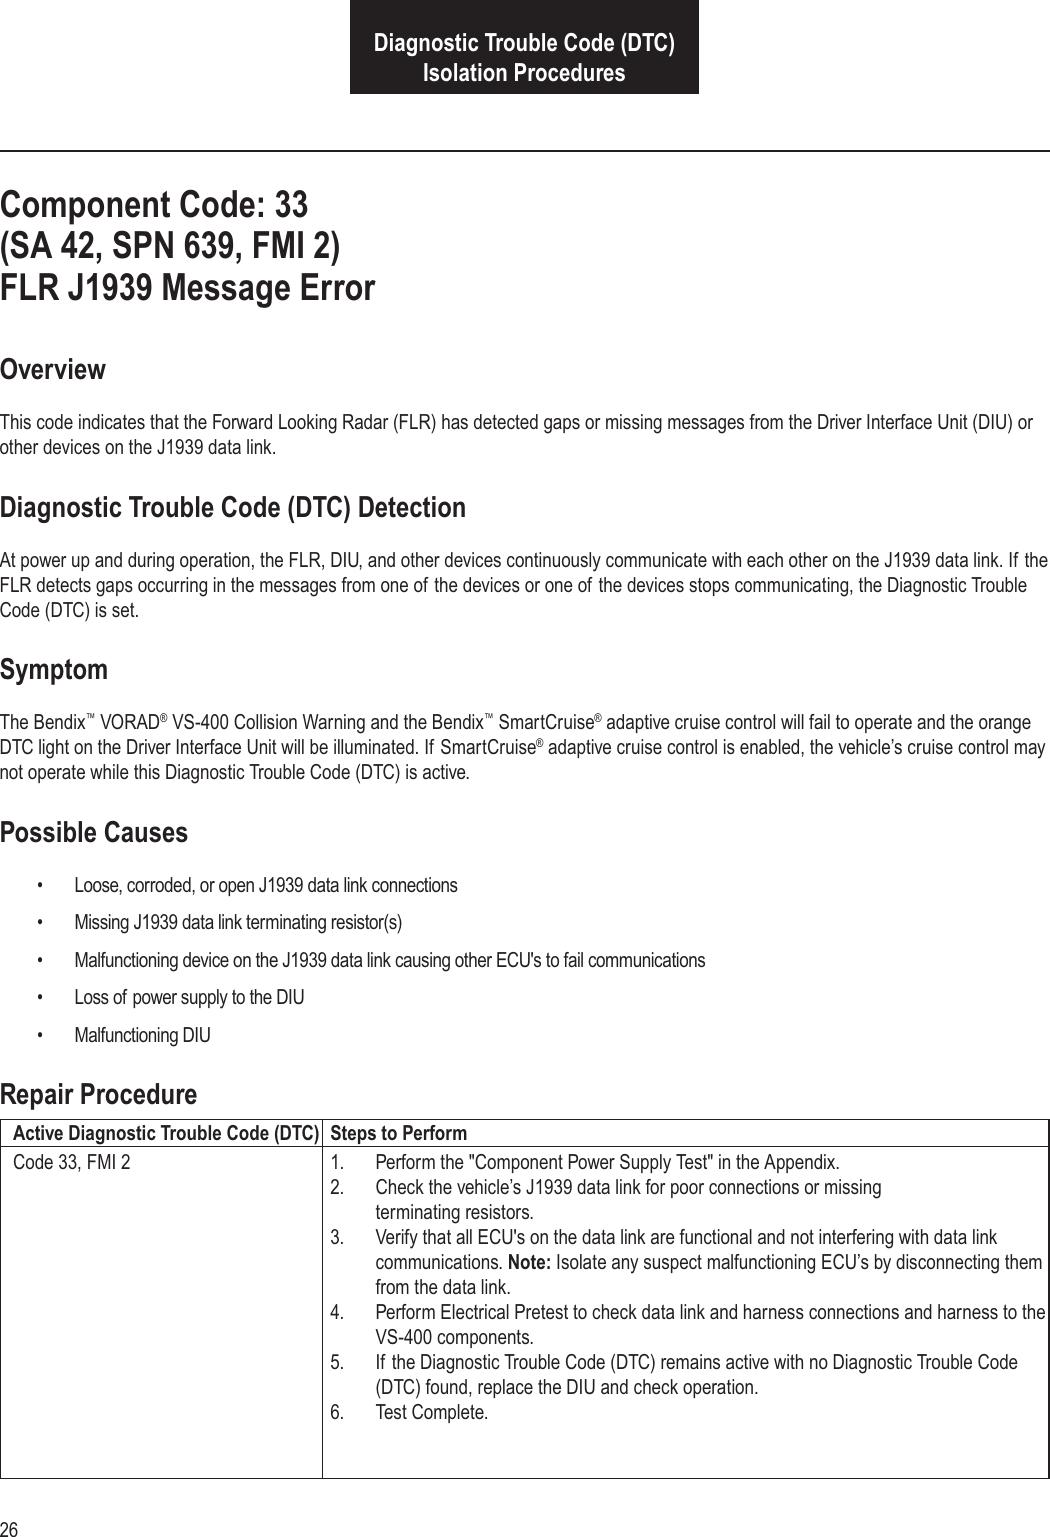 Bendix Bw2771 Users Manual